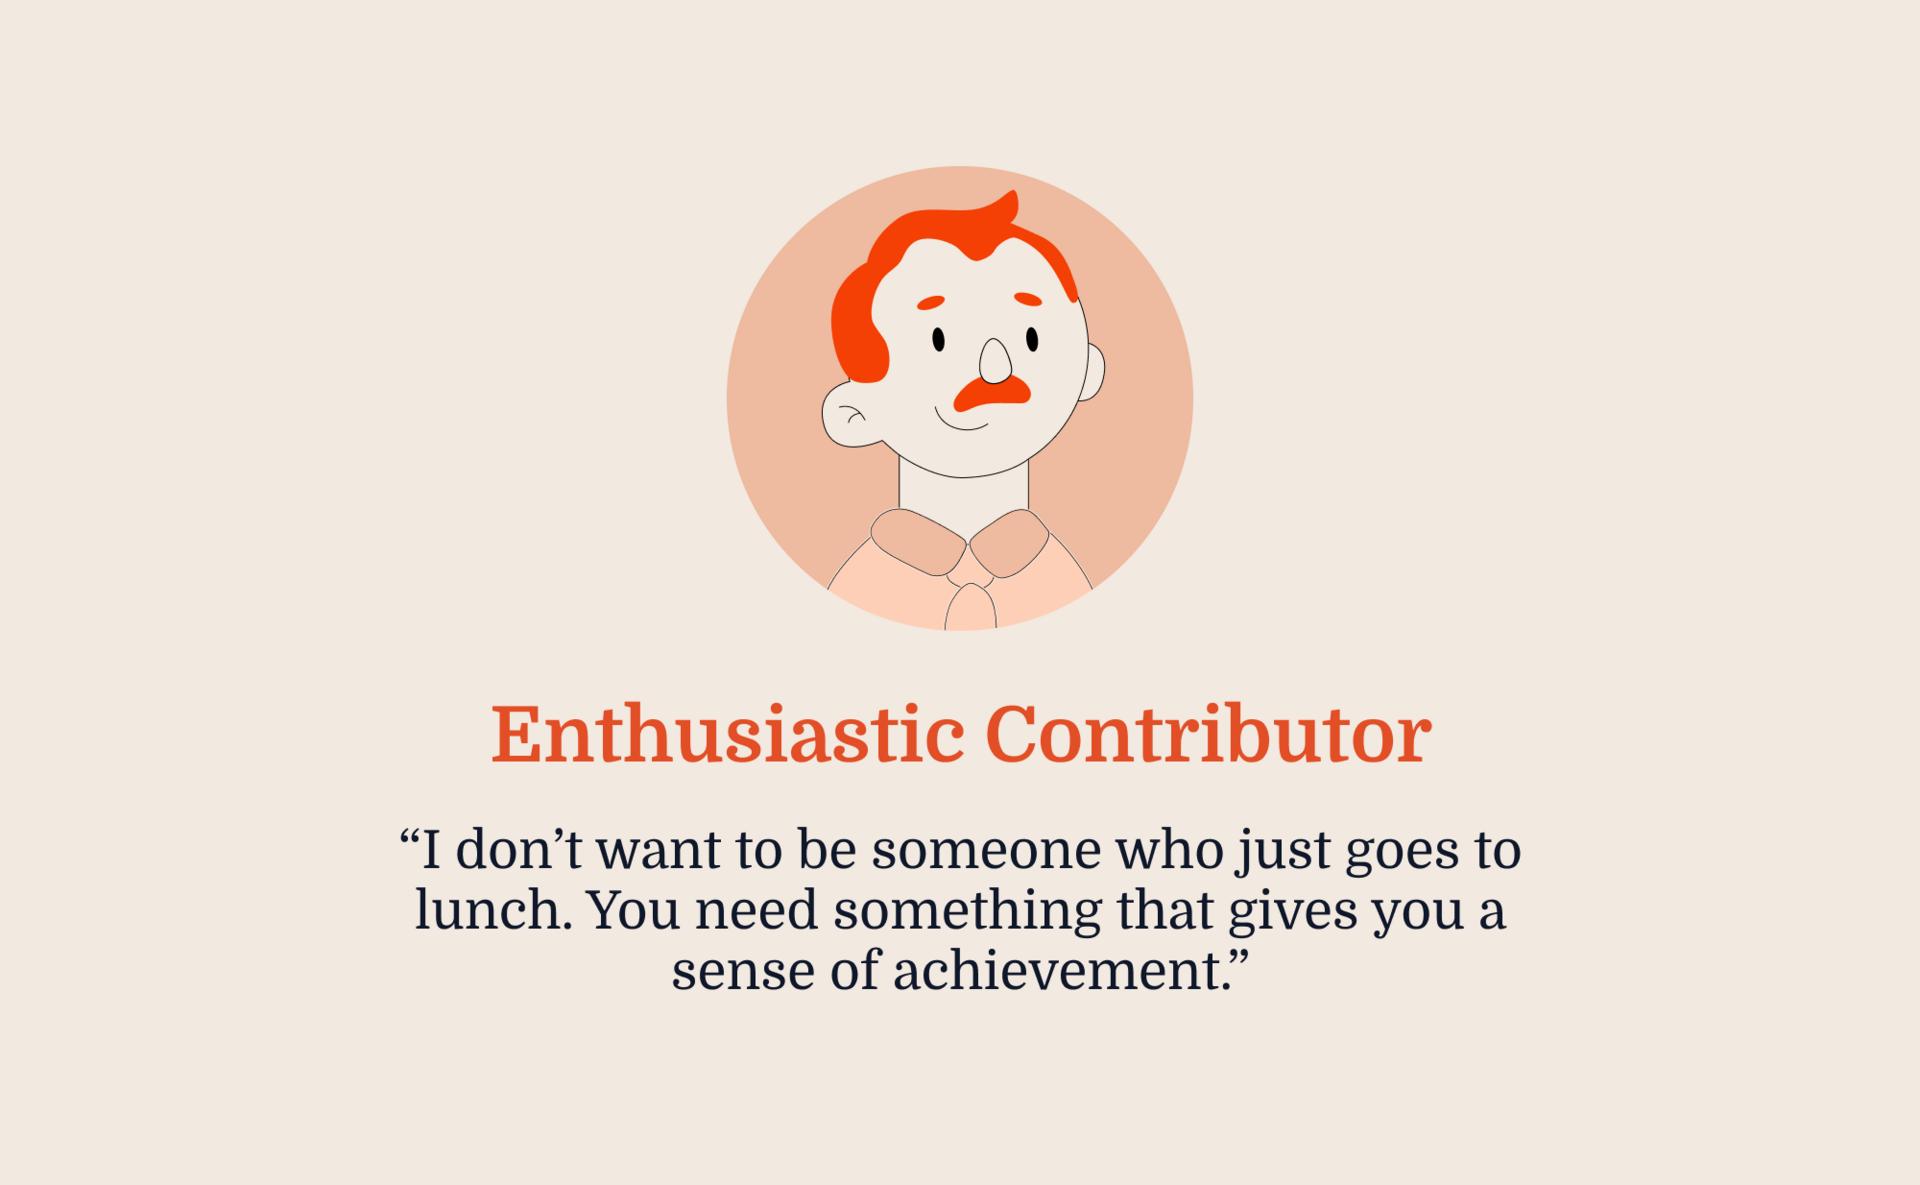 Contributors seek meaningful activity